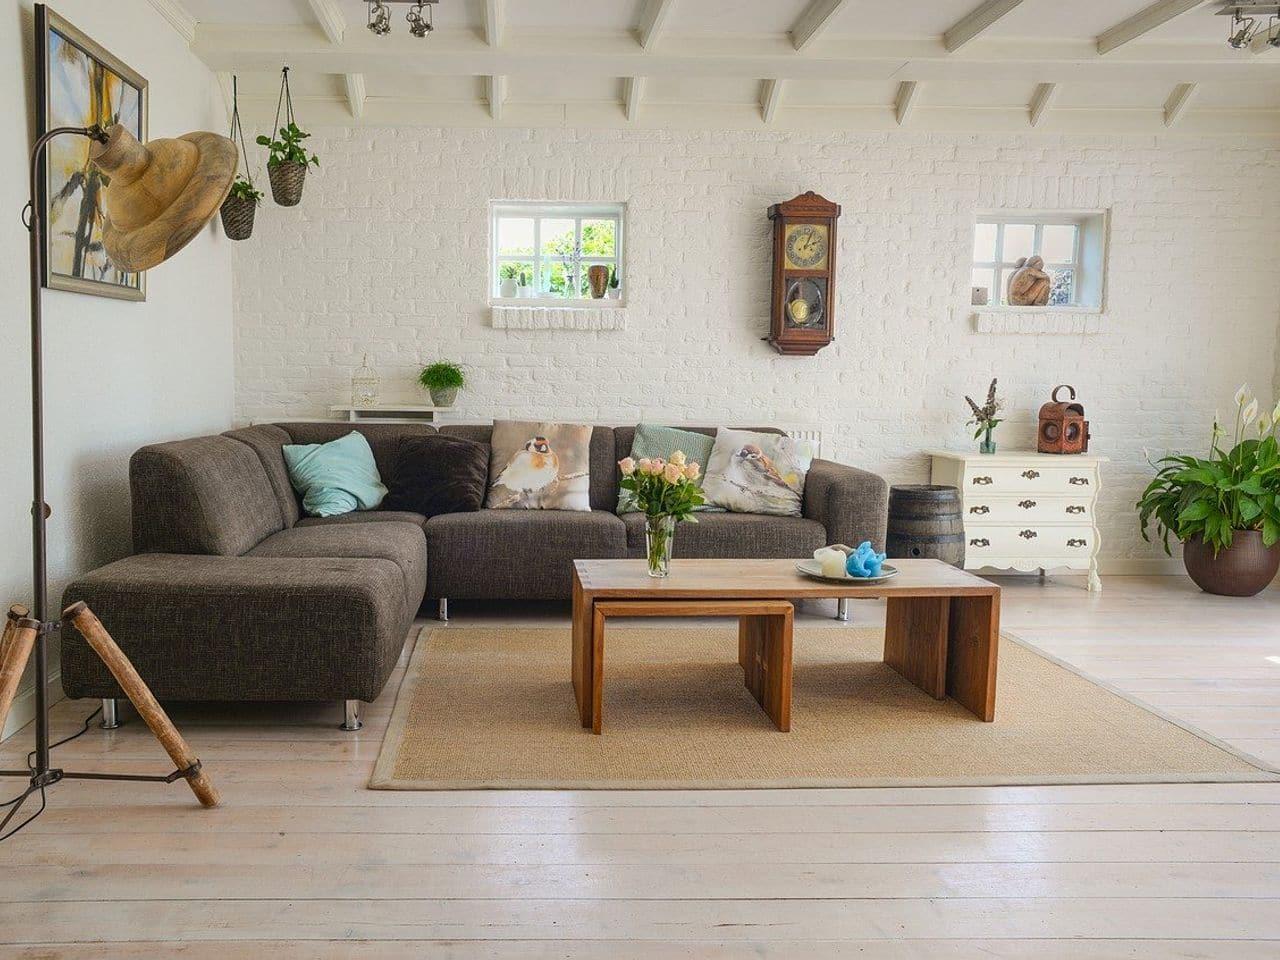 alfombras naturales decoracion